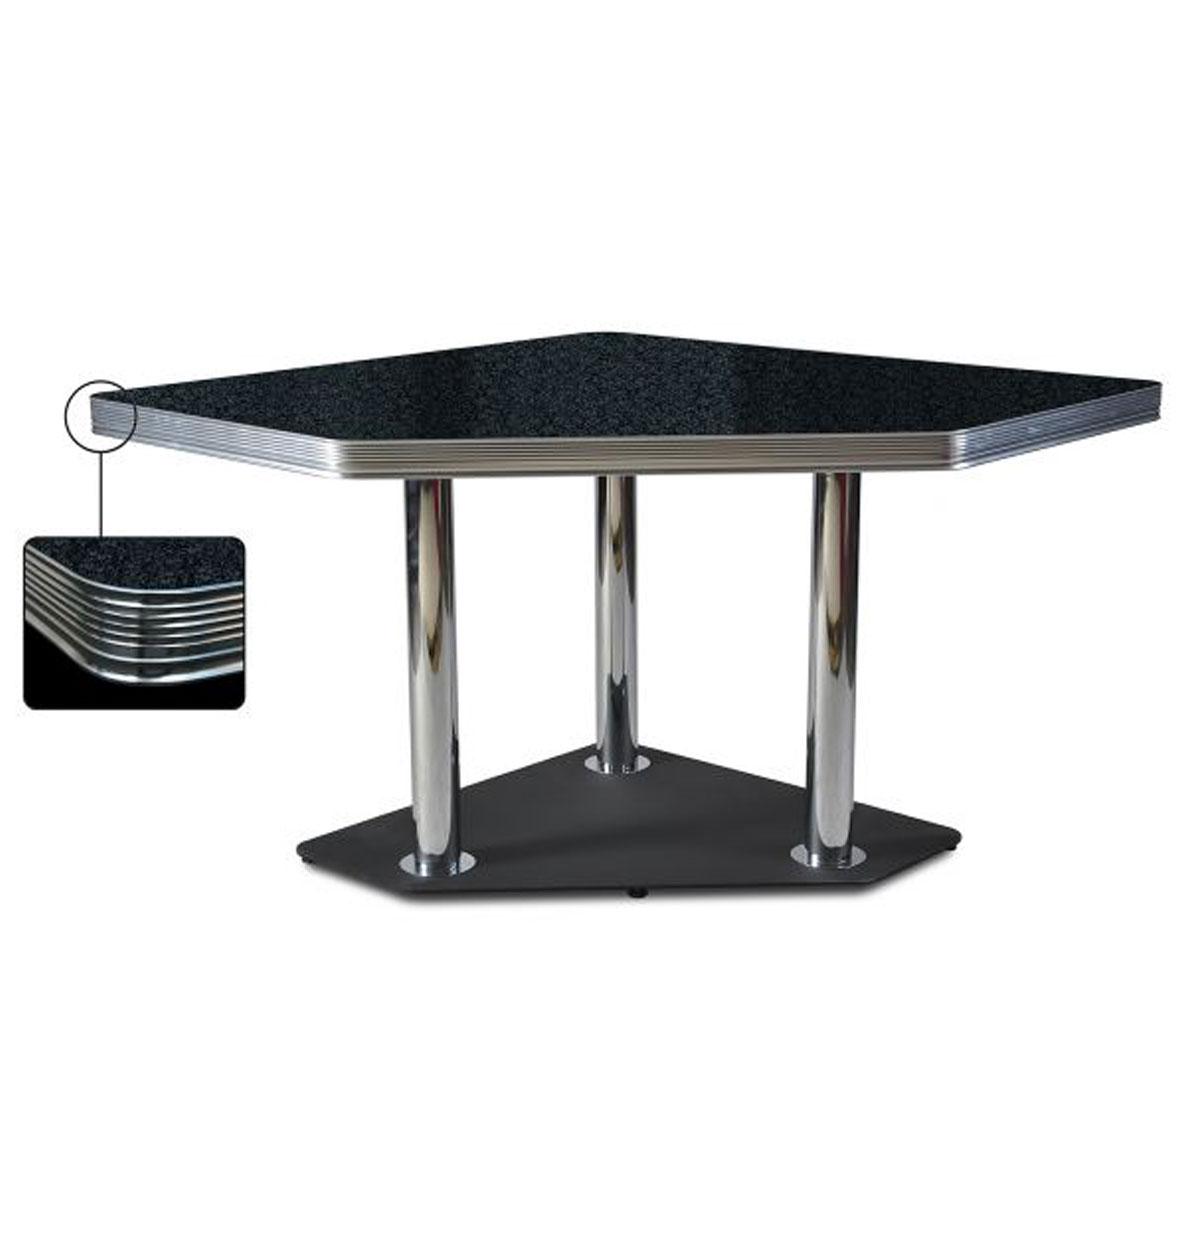 Diner Tafel TO-30 Blackstone